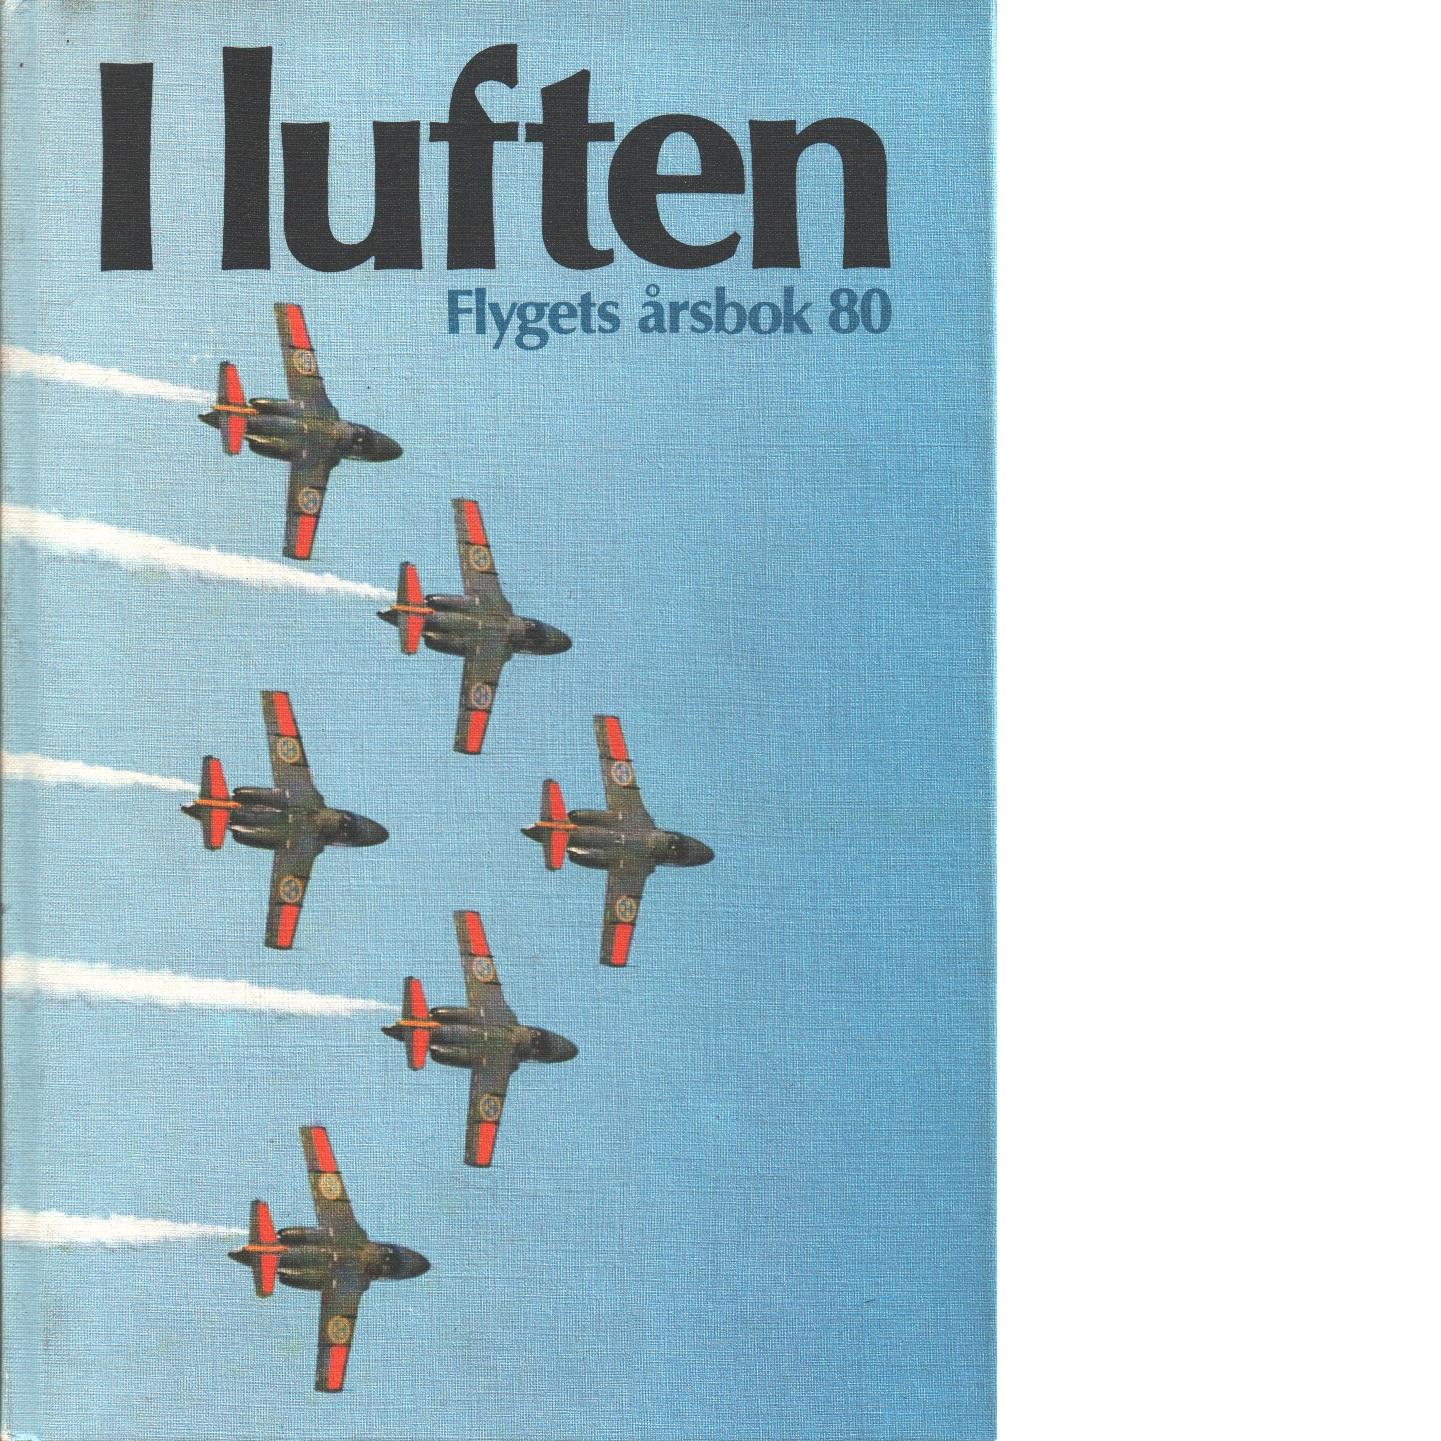 I LUFTEN FLYGETS ÅRSBOK 80 - KRISTOFFERSSON, PEJ